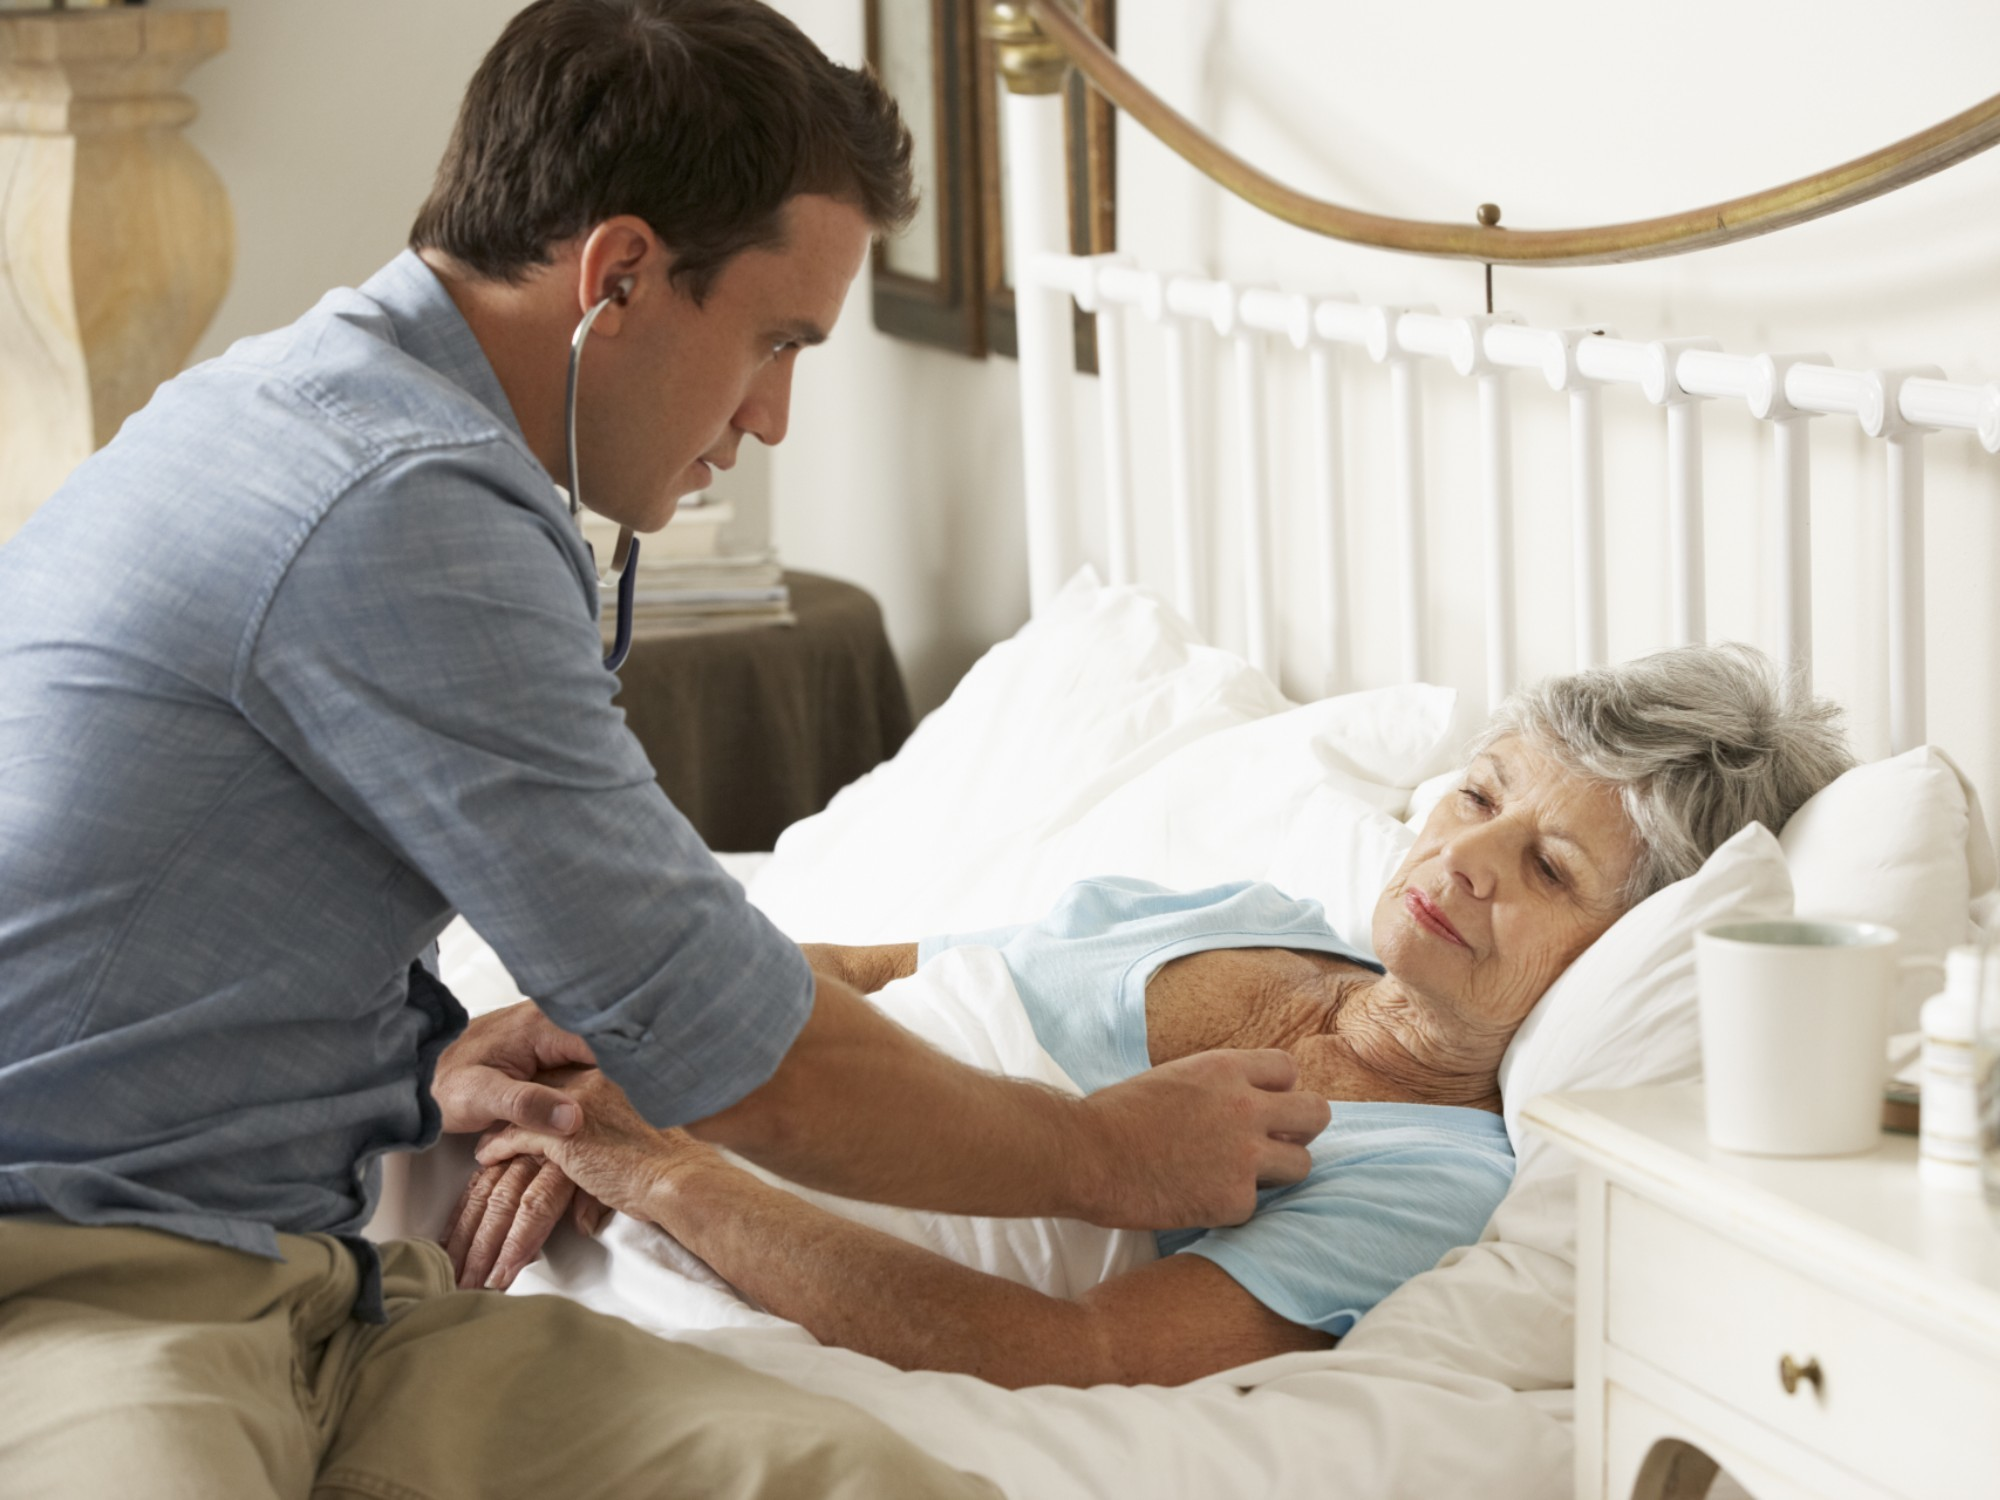 Woman receiving palliative care